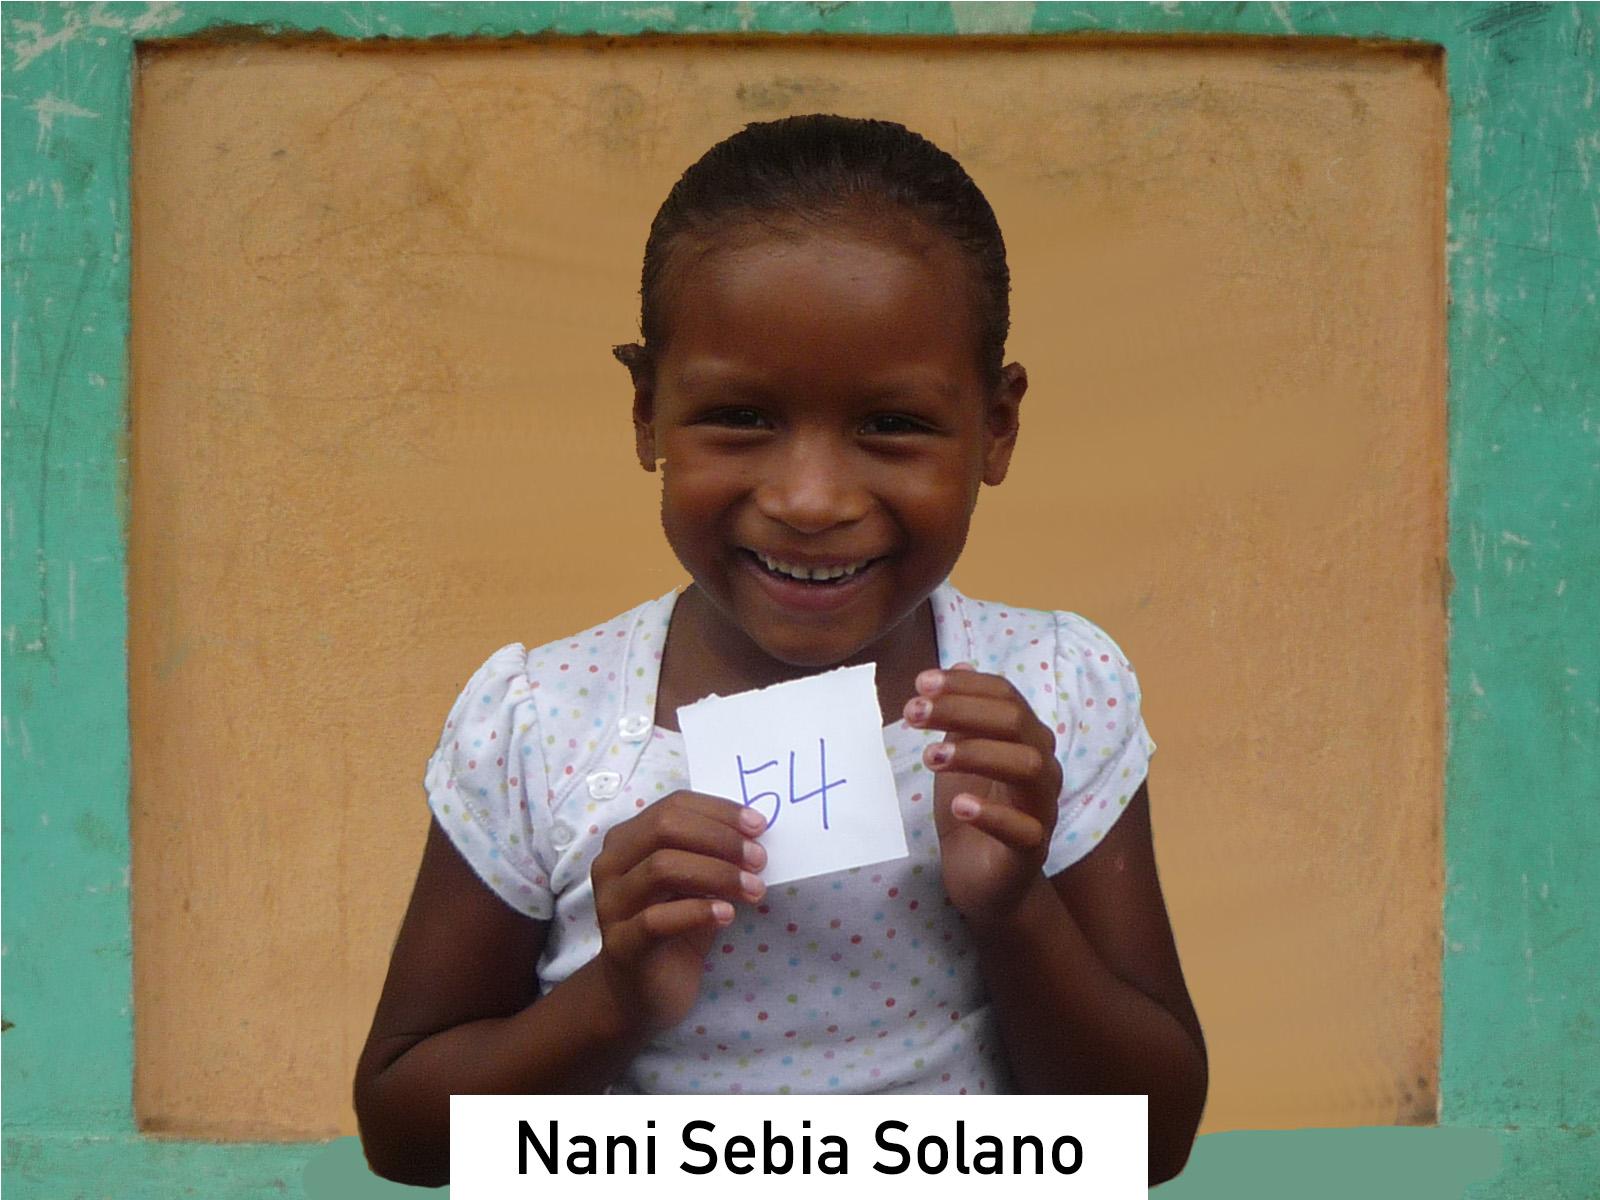 054 - Nani Sebia Solano.jpg